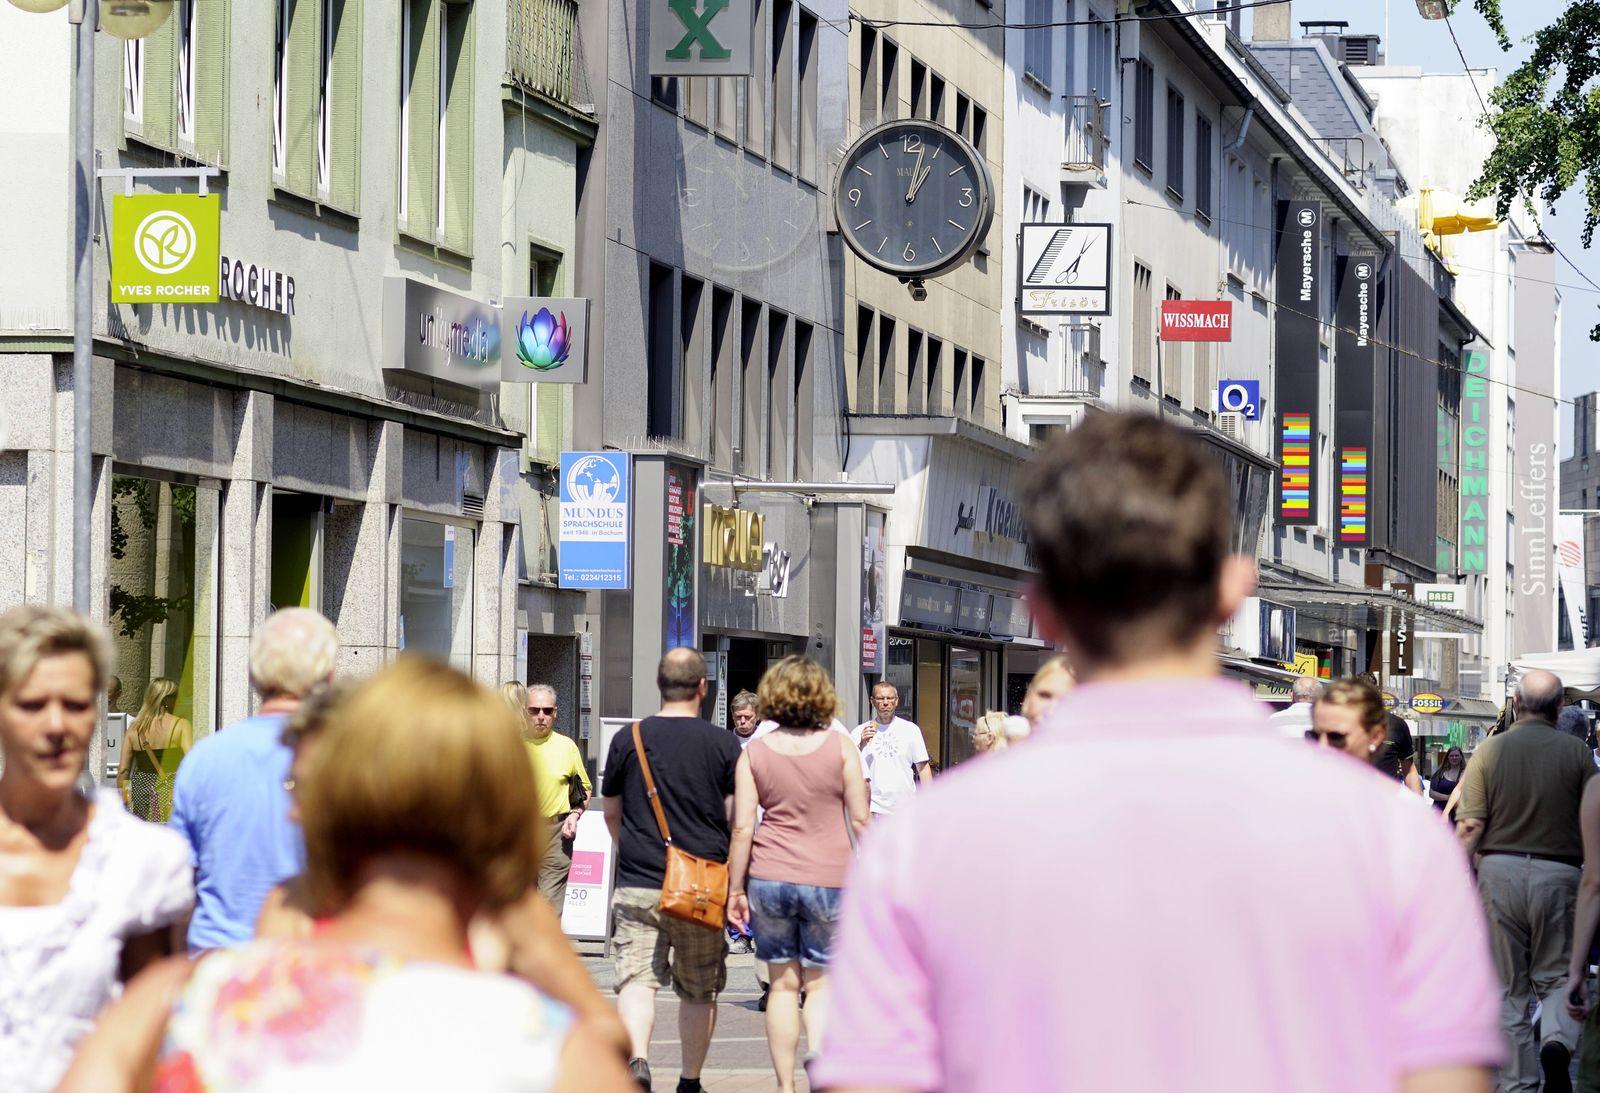 Bochum / passanten / Konjunktur / Menschen / Konsum / Armut